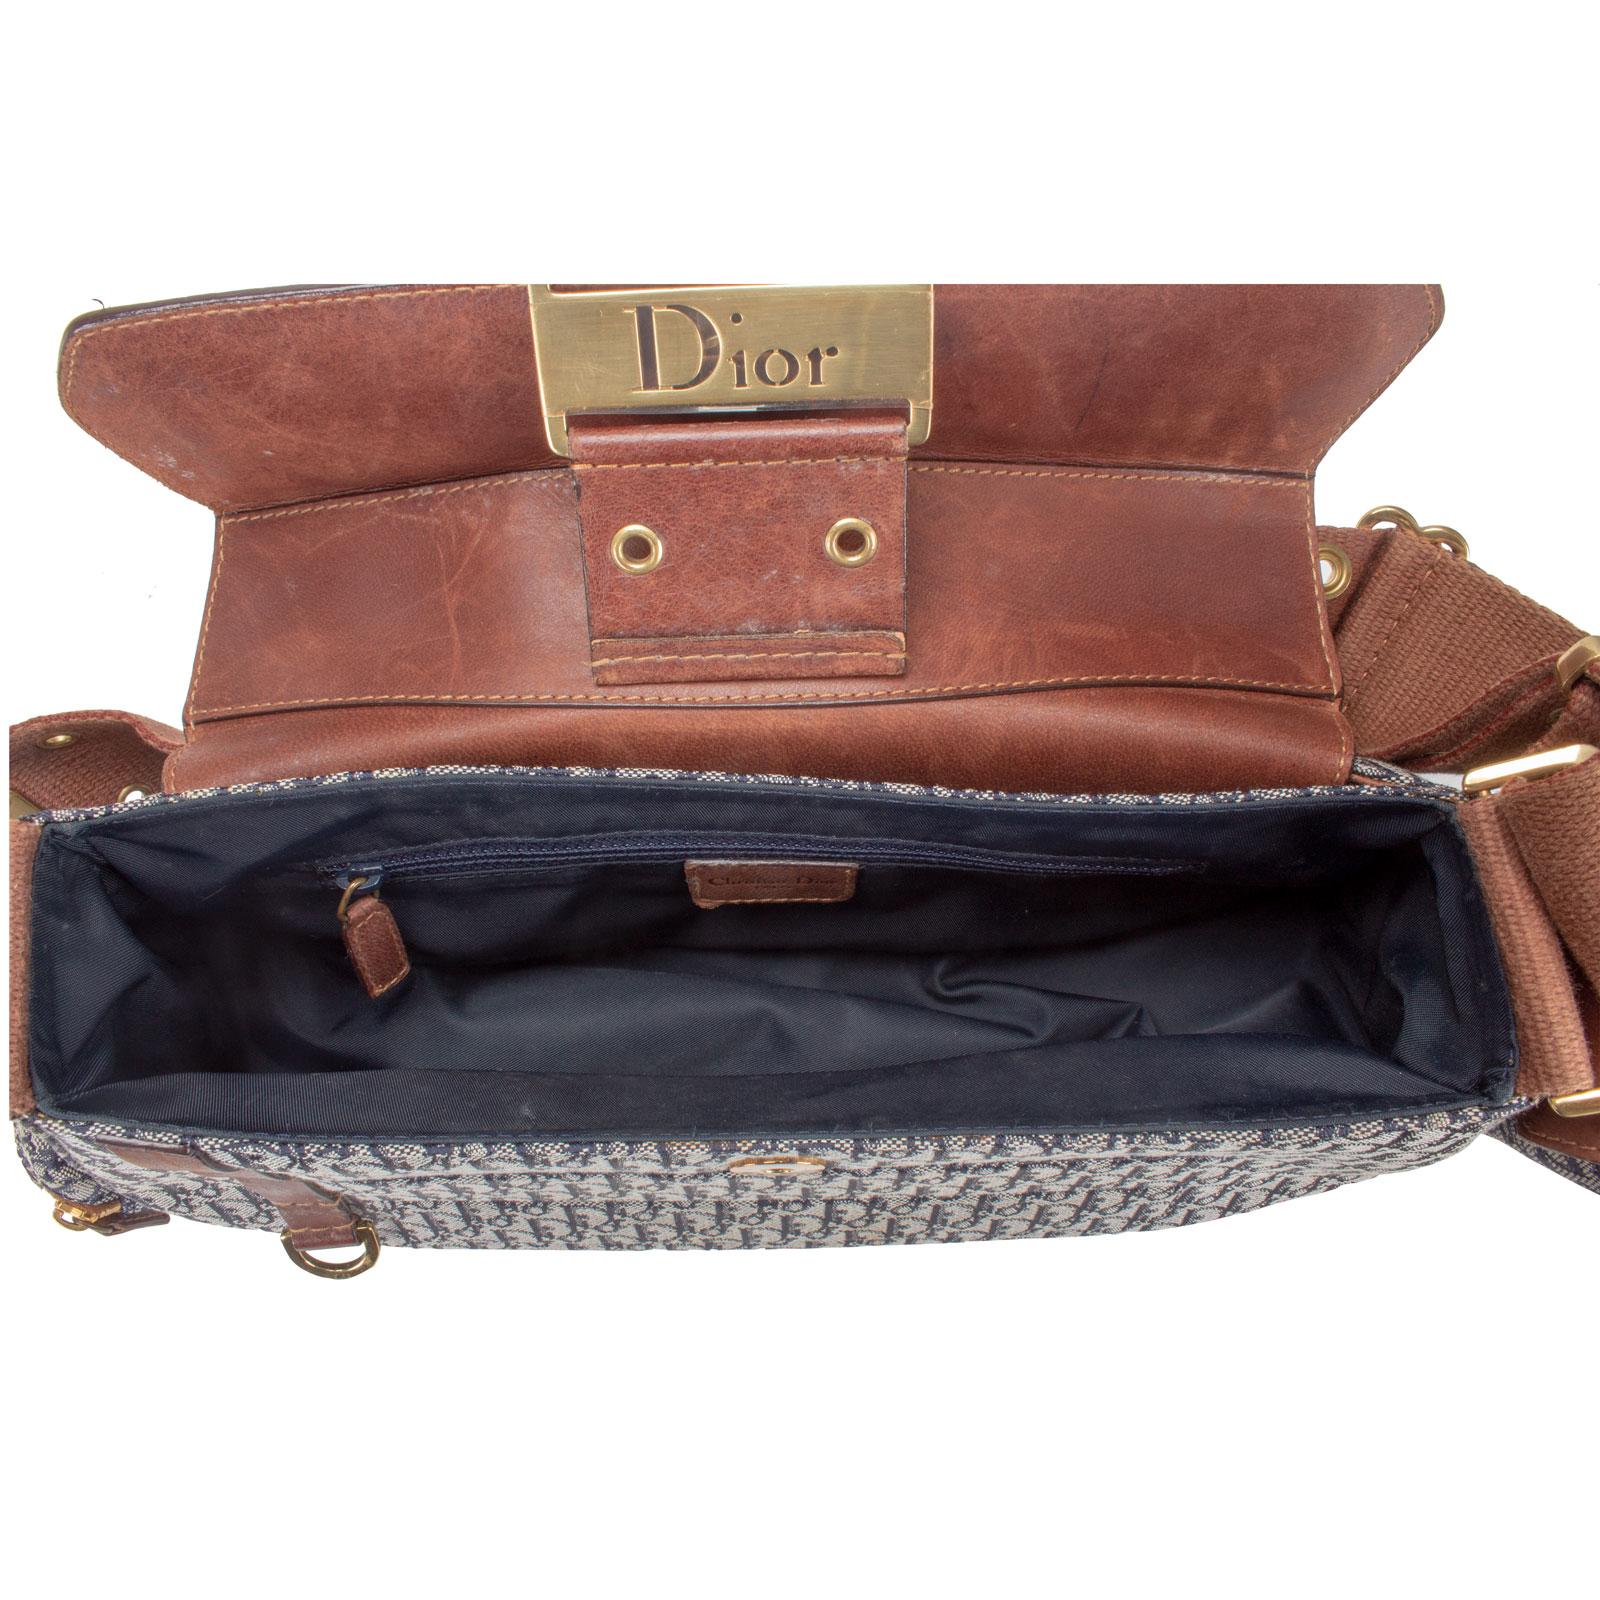 5584c7a9c Bolsa Dior Street Chic Columbus Jacquard | Box de Grife